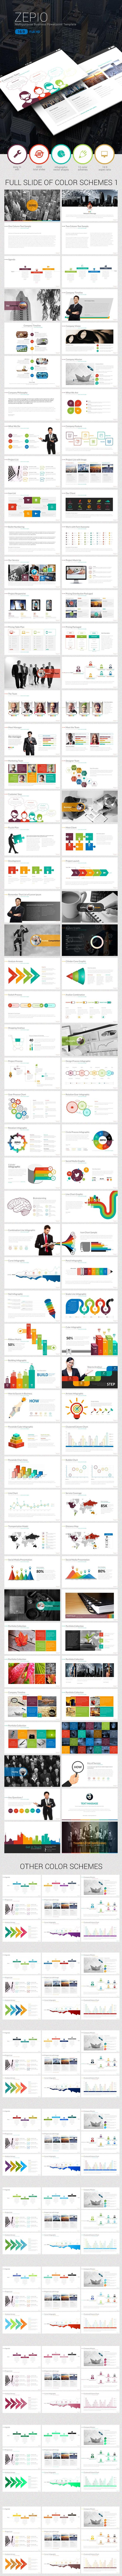 Zepio - Business Powerpoint Template